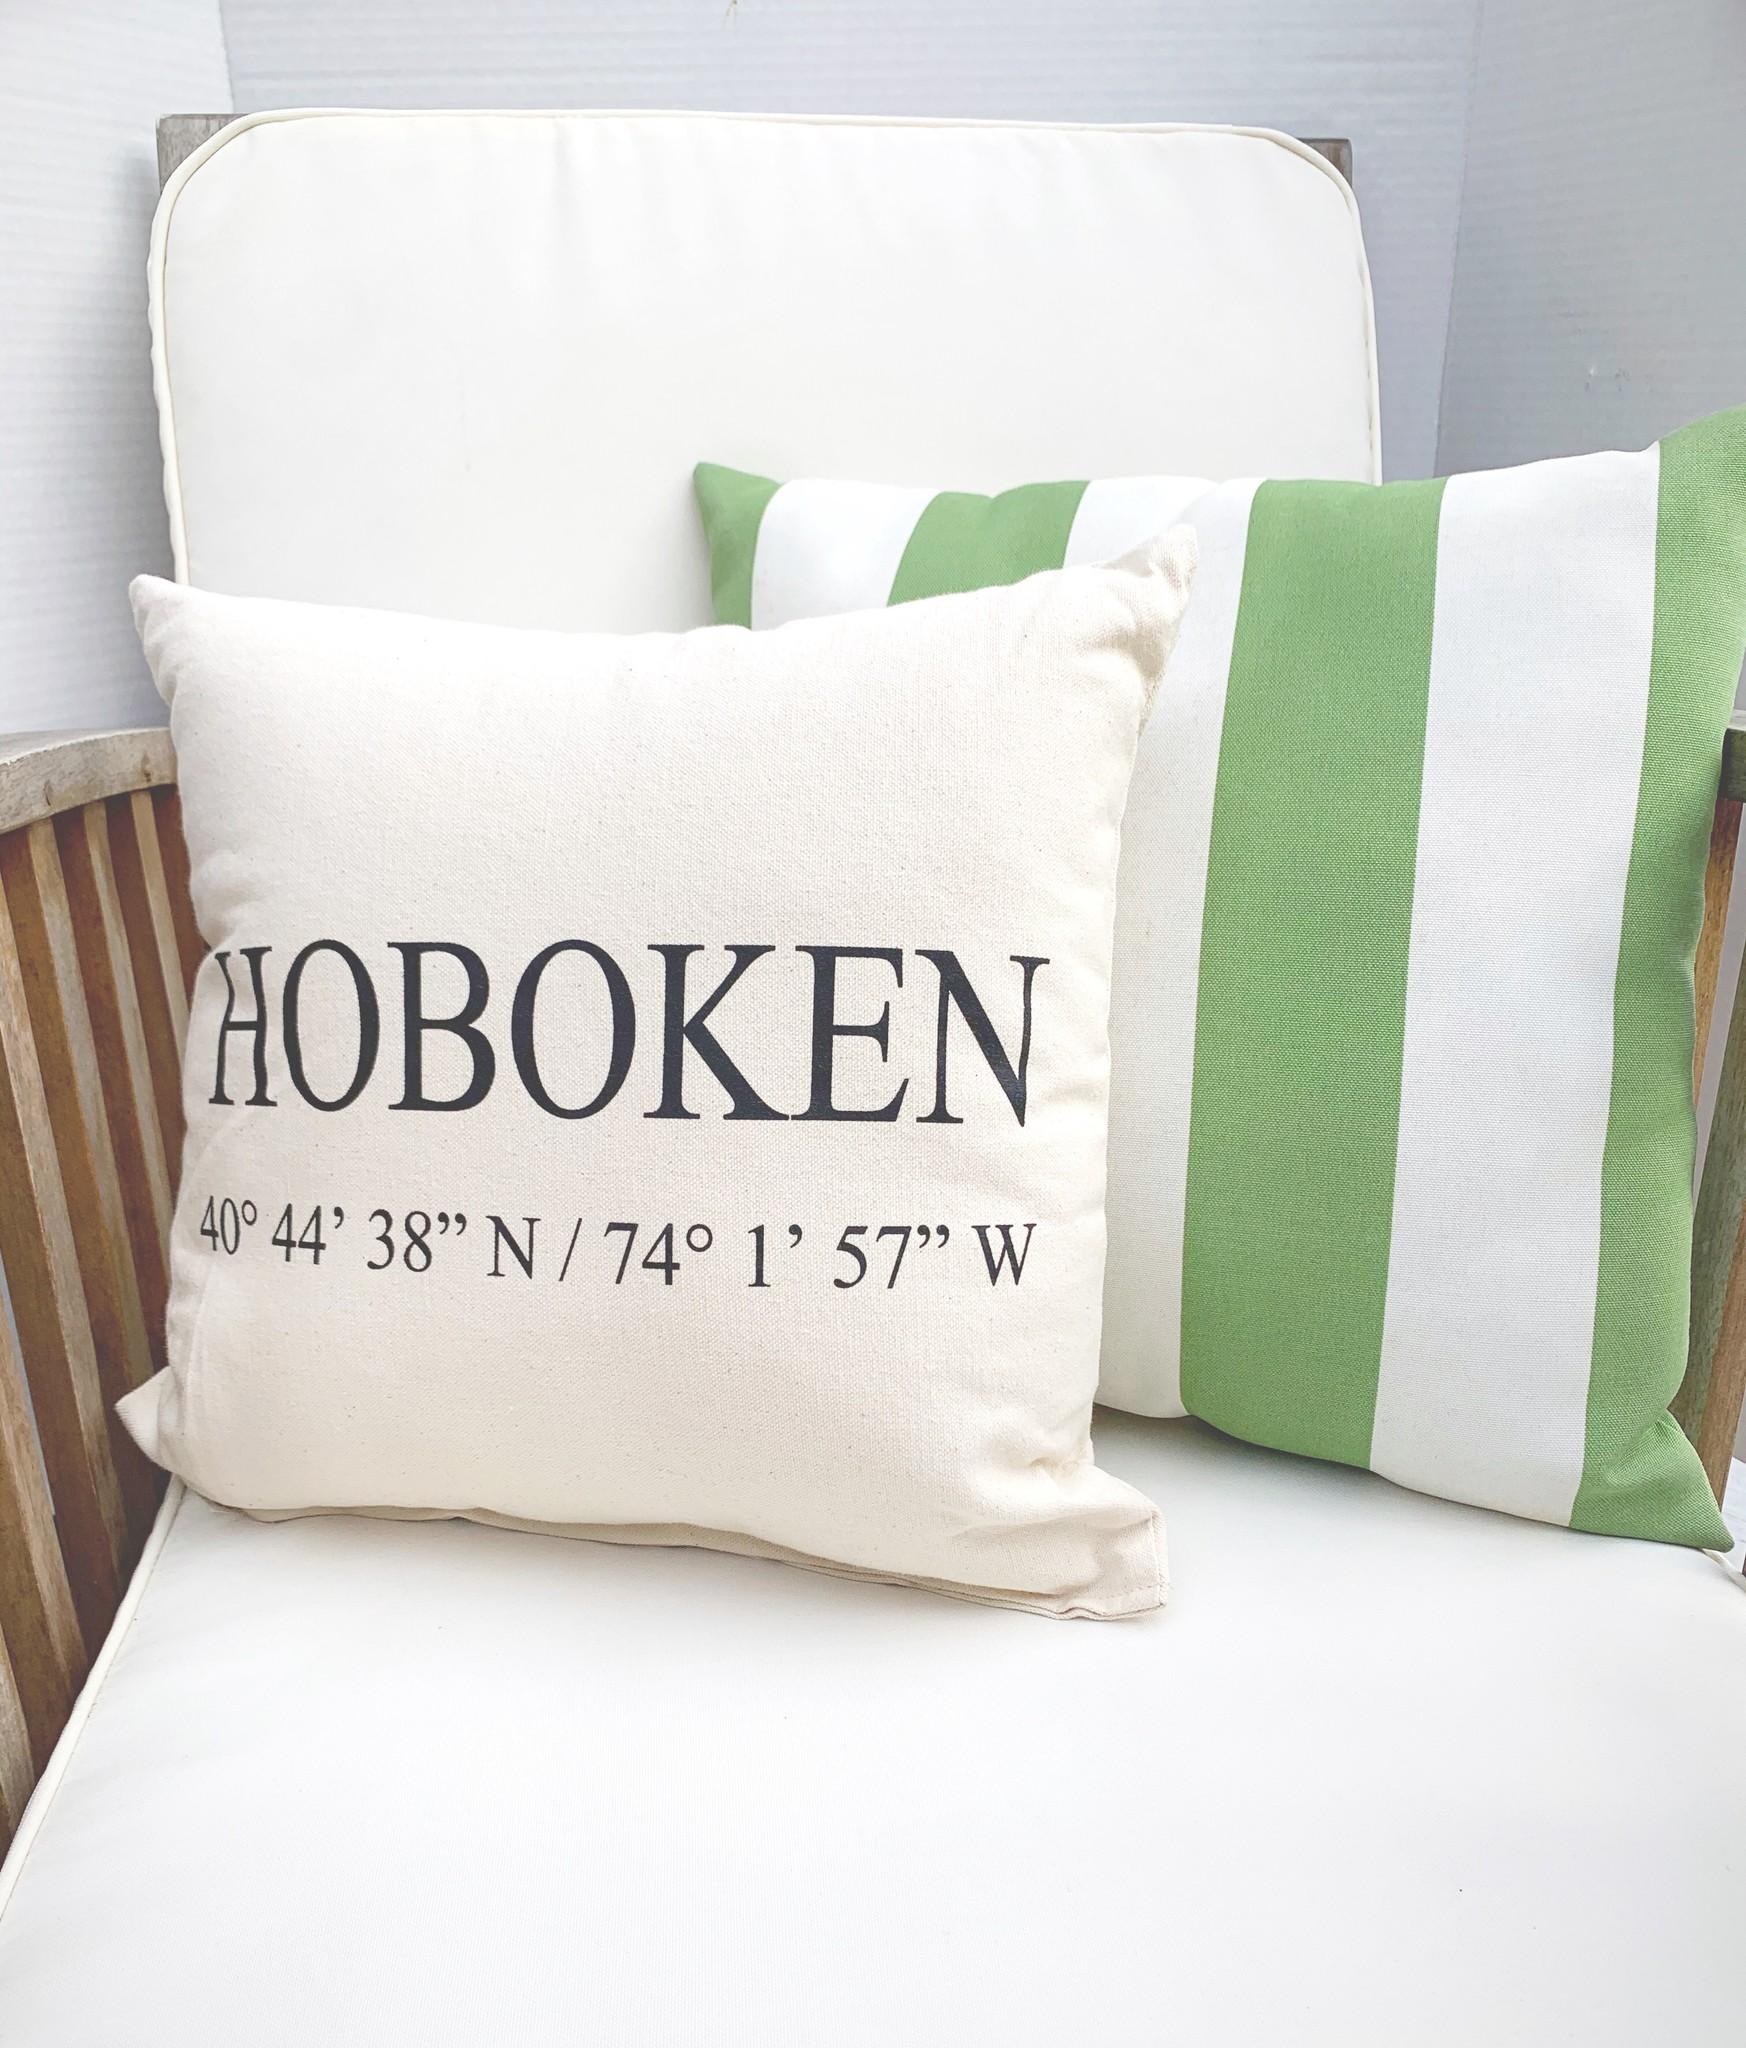 Eric & Christopher Hoboken Pillow